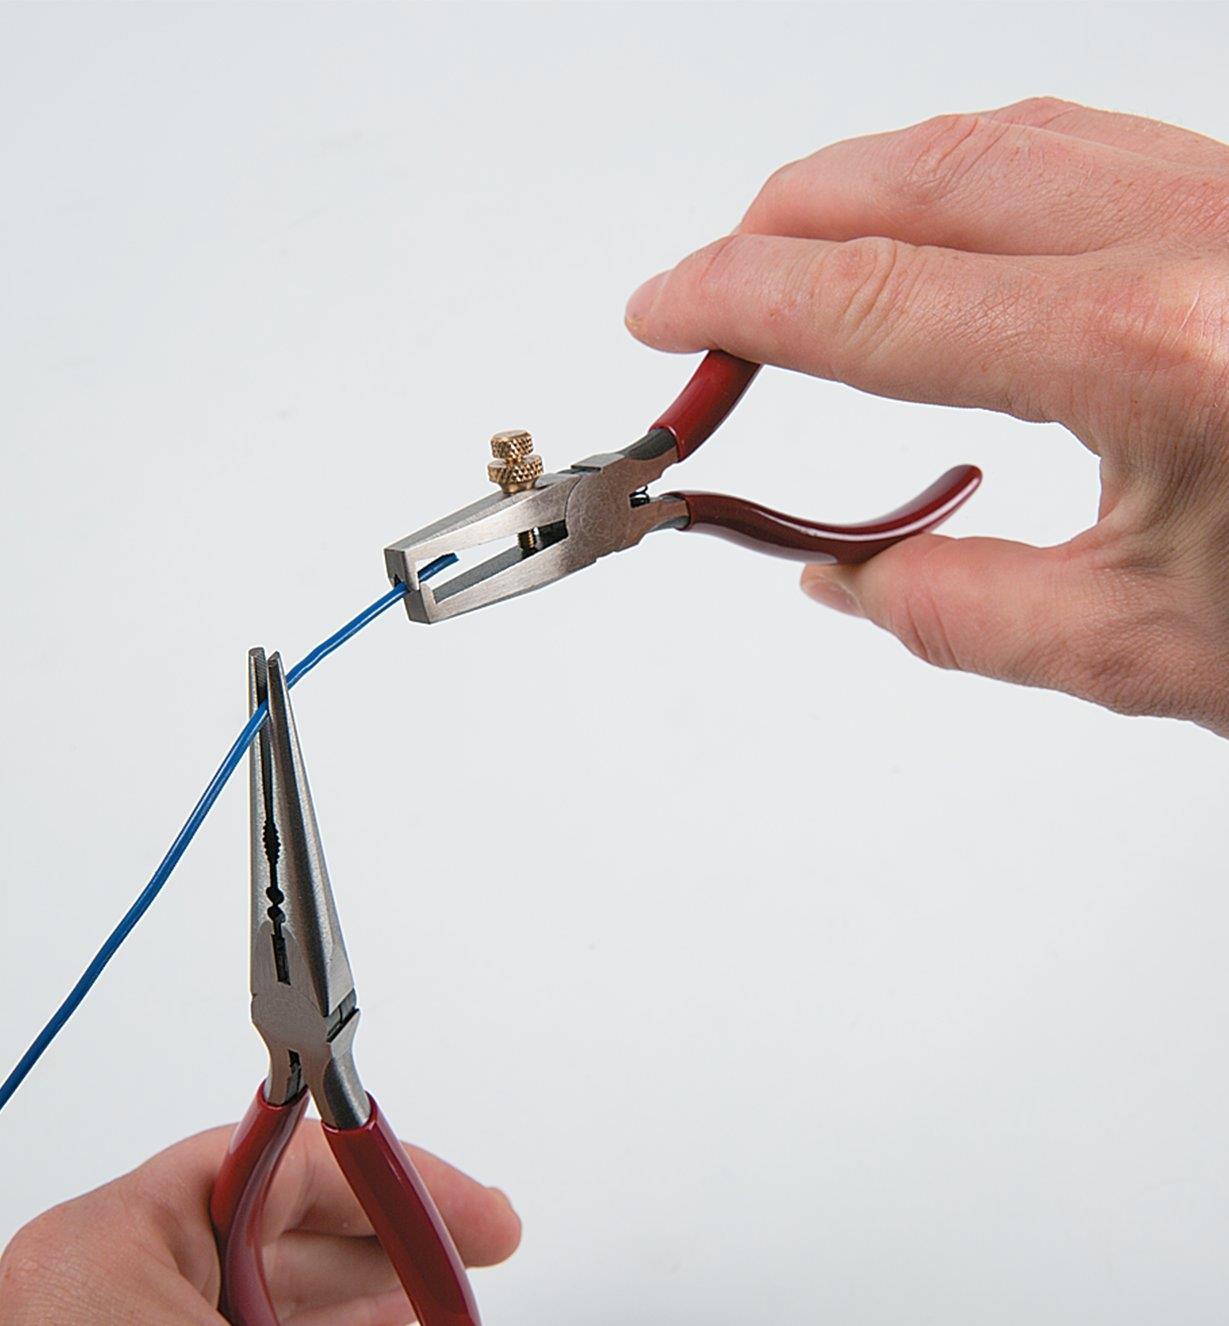 60K2307 - Mini Wire Strippers